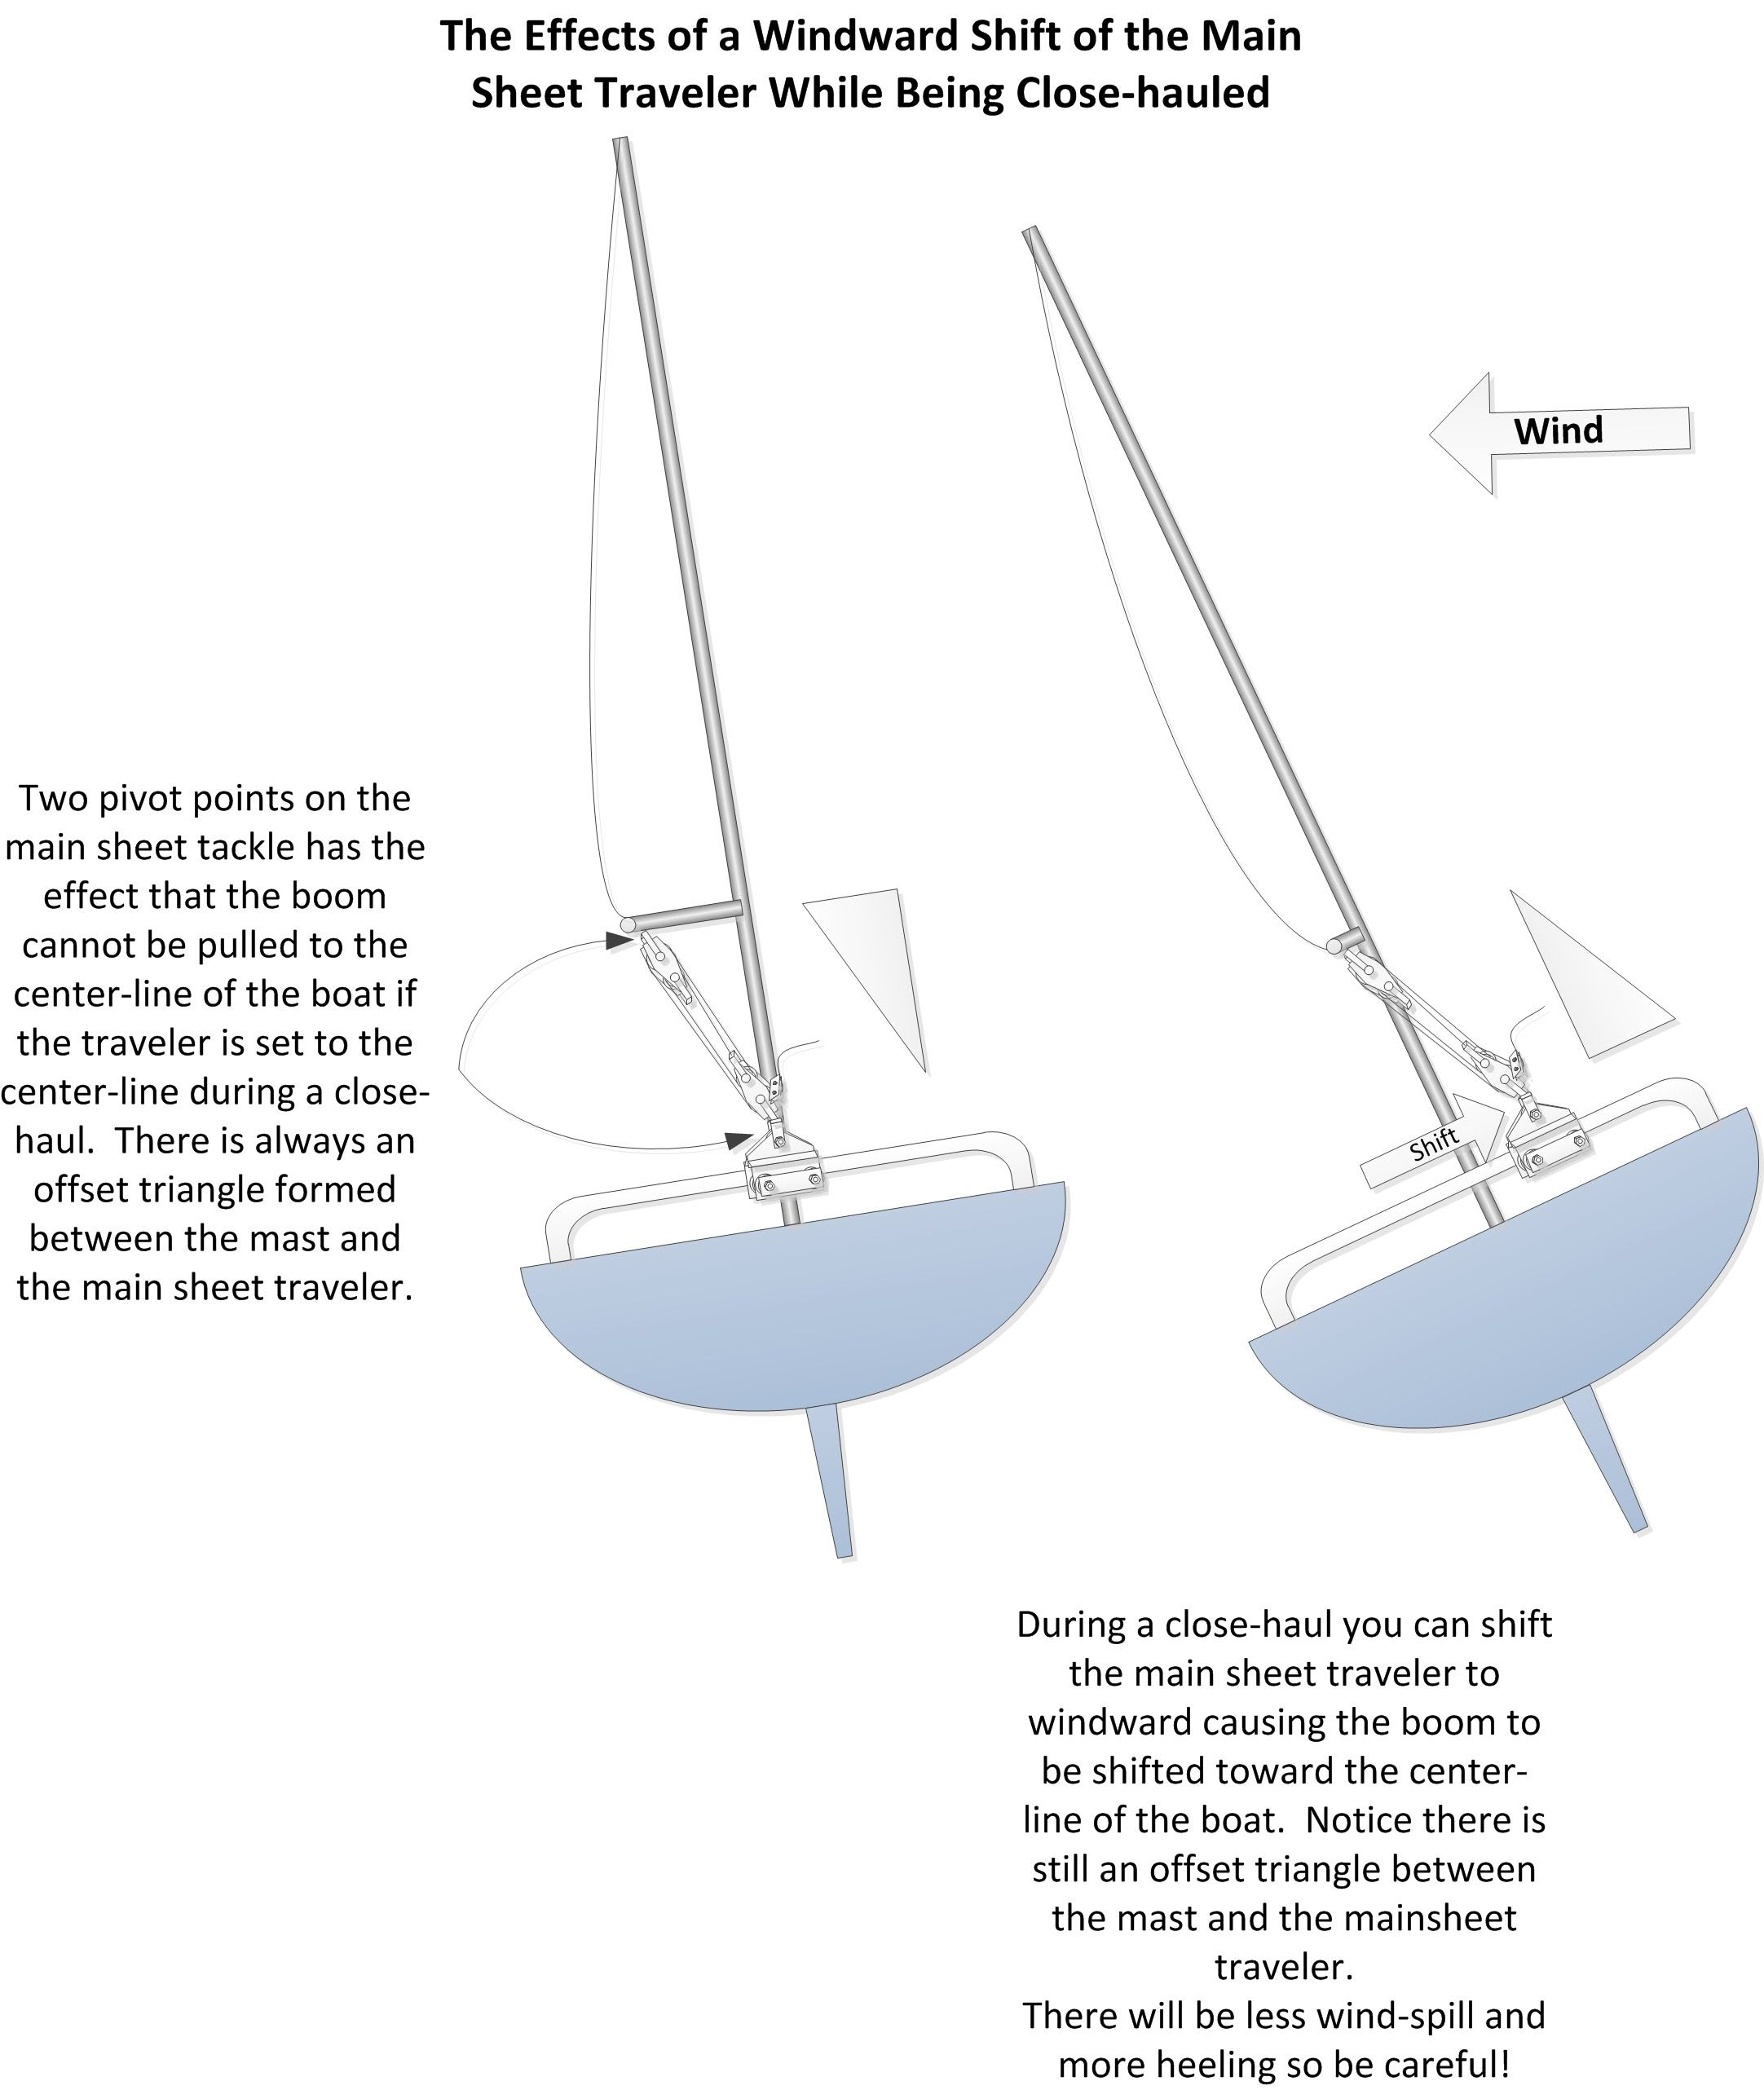 small resolution of upgrades repairs c22 c 22 catalina 22 sailboat modifications projects catalina rigging maintenance maintaining mast stepping restoring